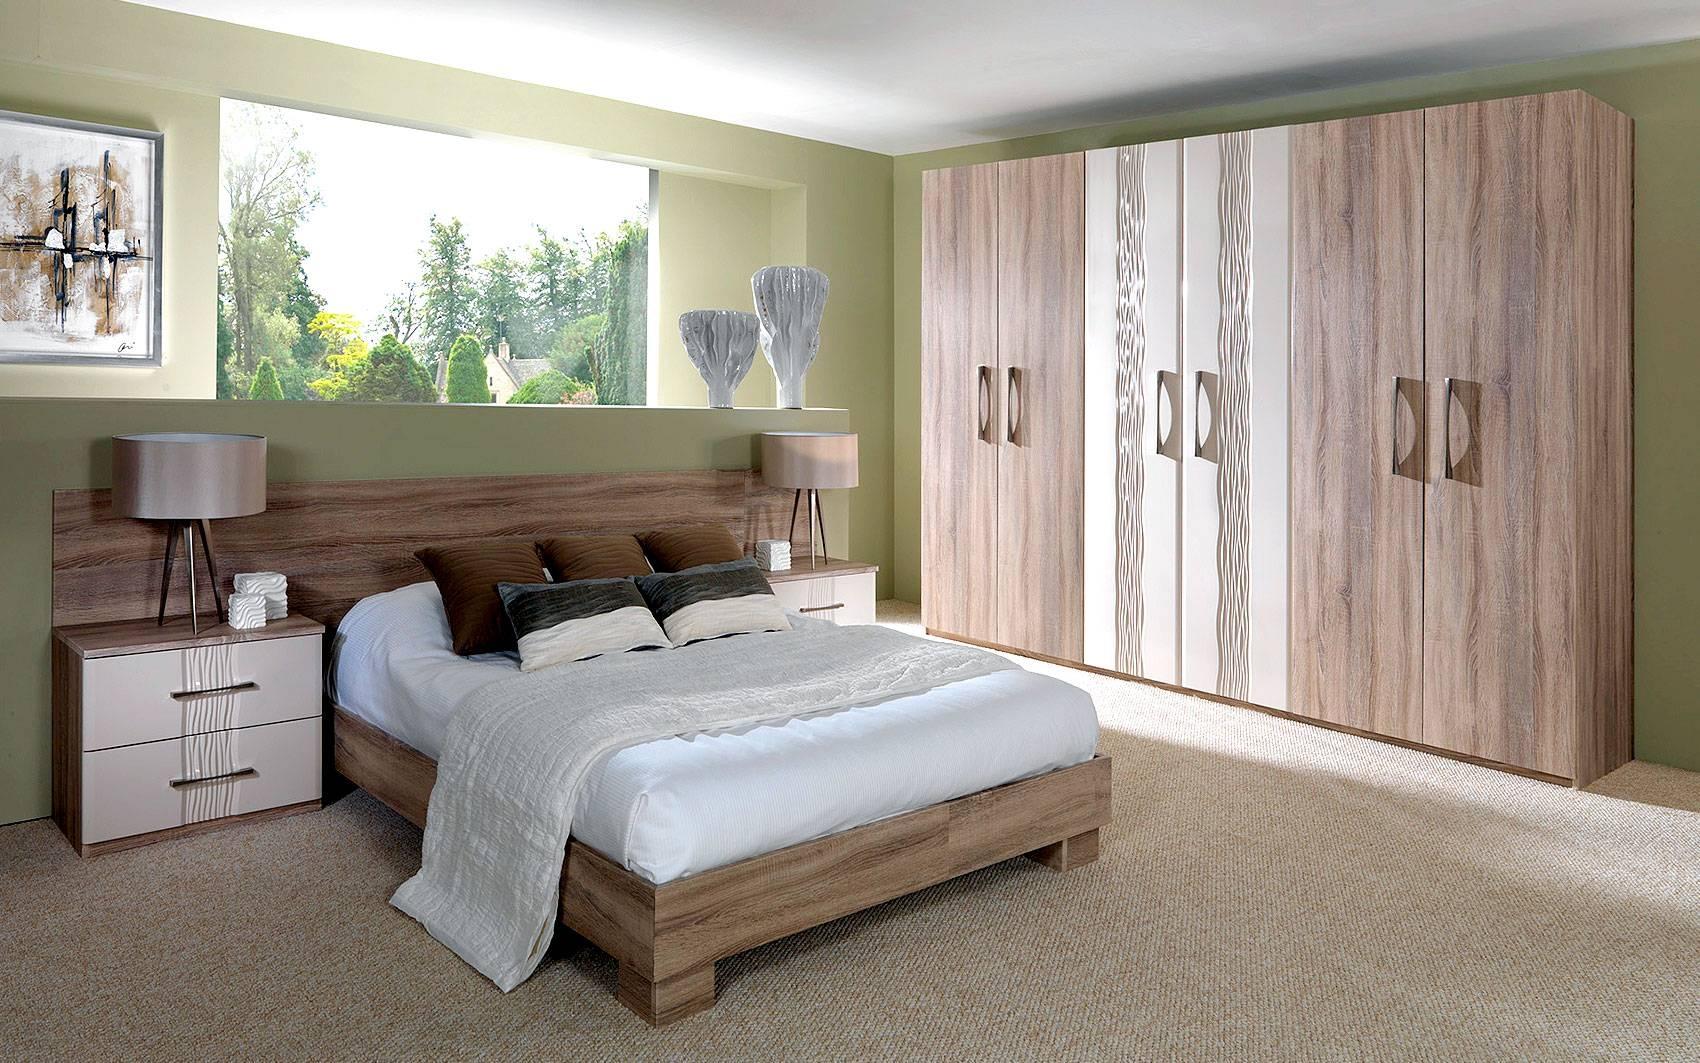 Wardrobe : Built In Wardrobes Bristol Uk Wardrobe Furniture Throughout Solid Wood Built In Wardrobes (View 27 of 30)